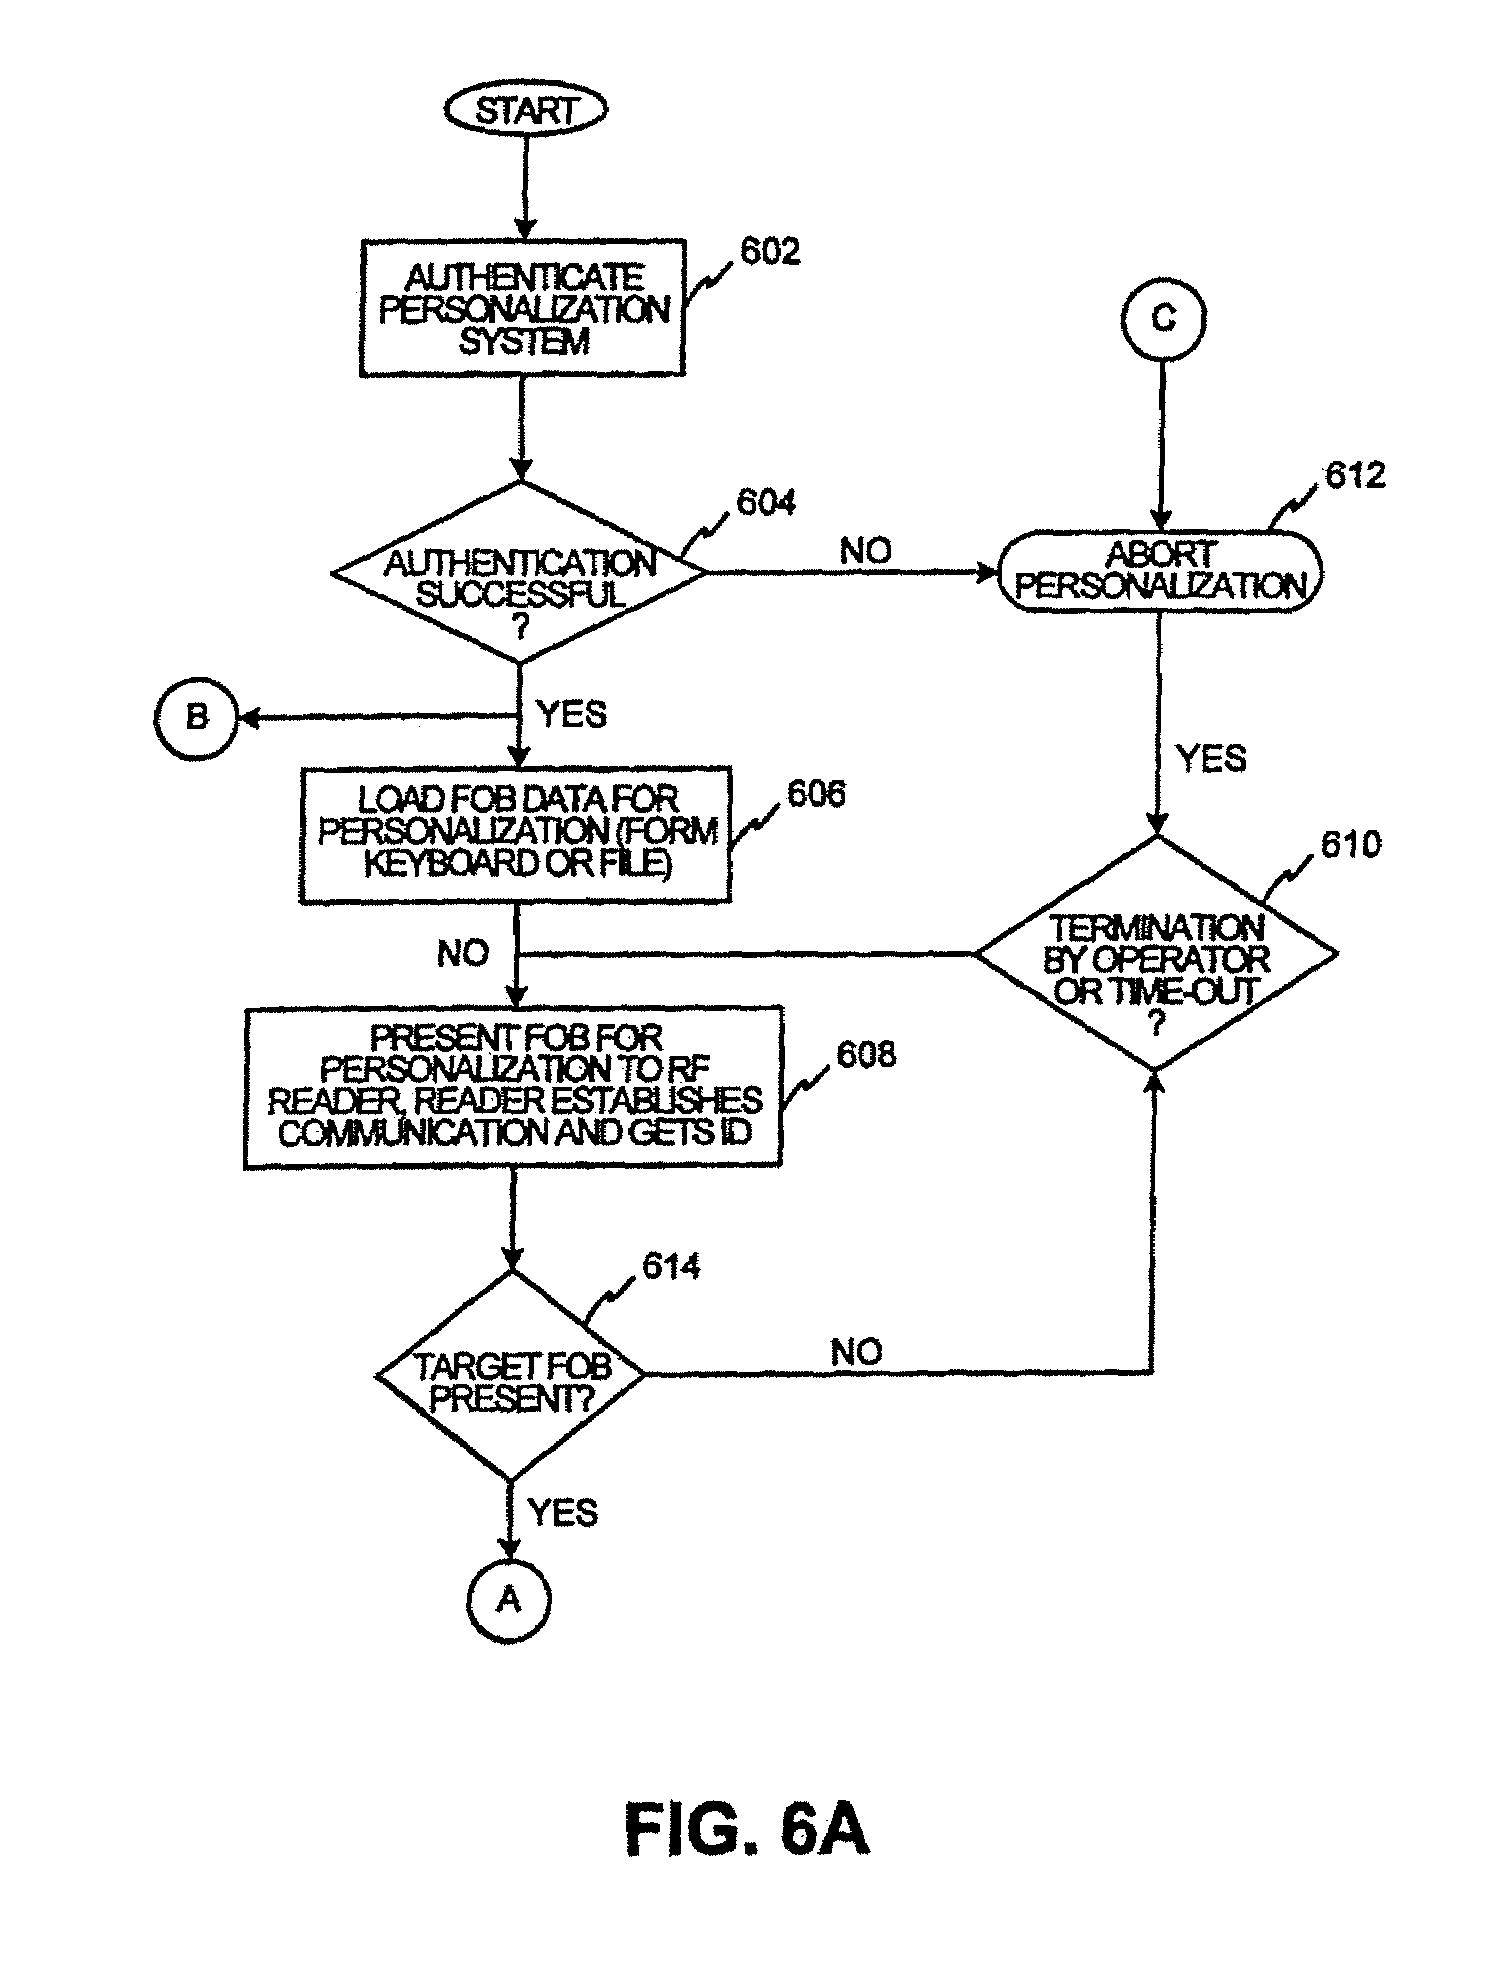 hdmi plug wiring diagram wiring diagram HDMI to Analog RCA Pinout micro usb to hdmi wiring diagram 11 24 kenmo lp de u2022hdmi plug schematic wiring